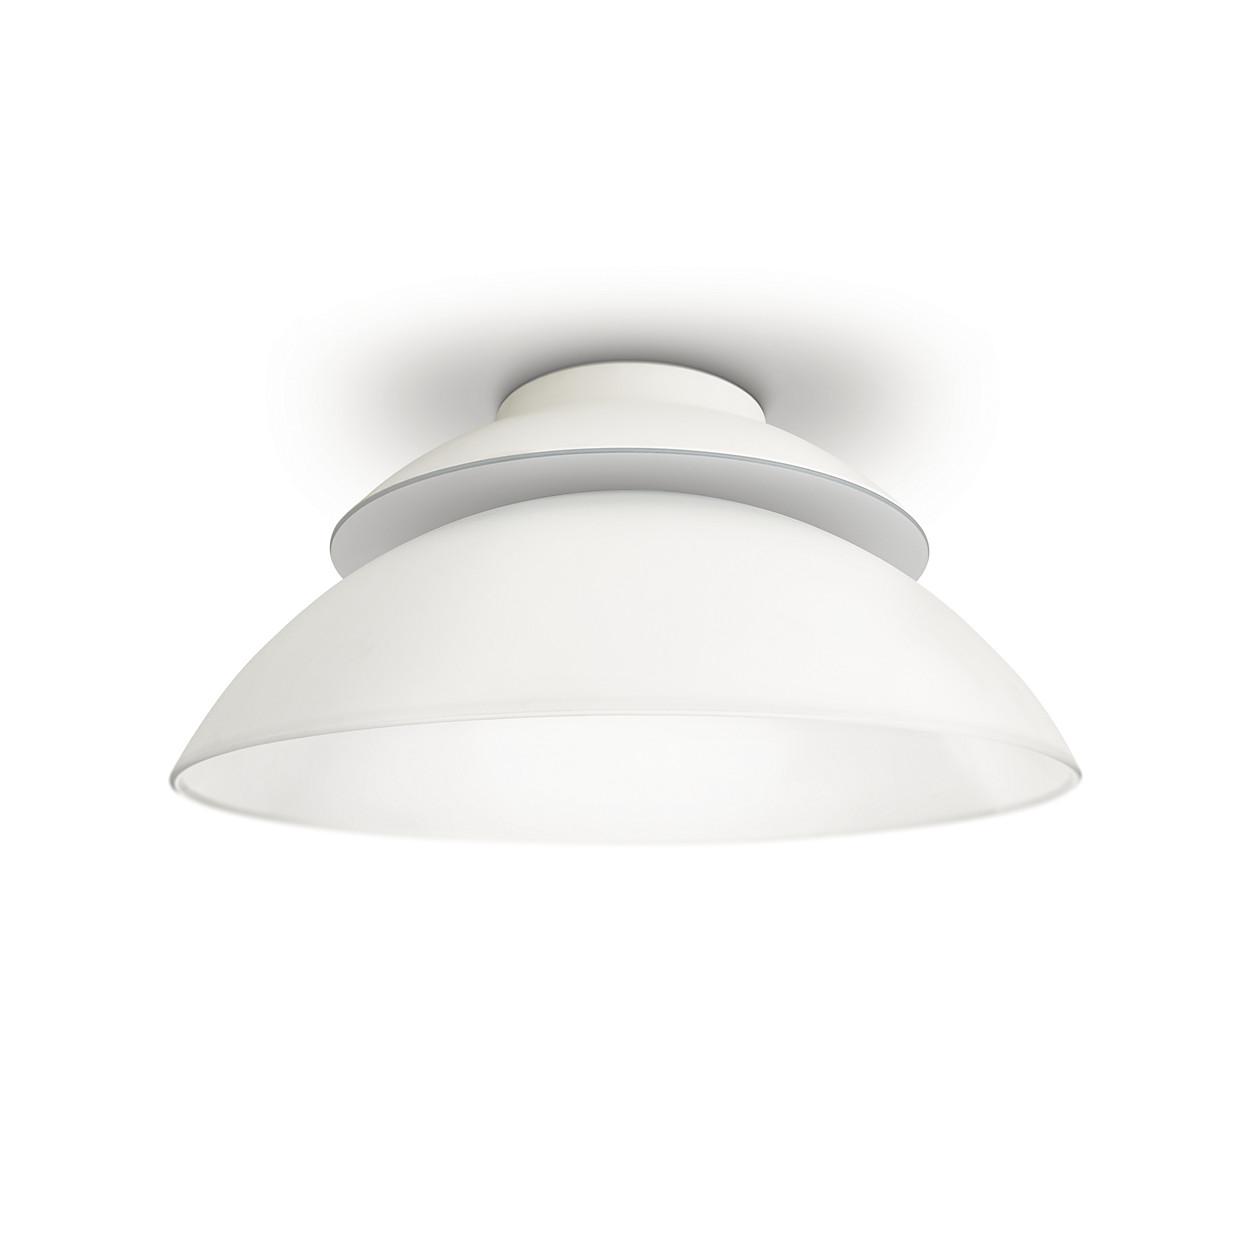 hue personal wireless lighting ceiling light. Black Bedroom Furniture Sets. Home Design Ideas